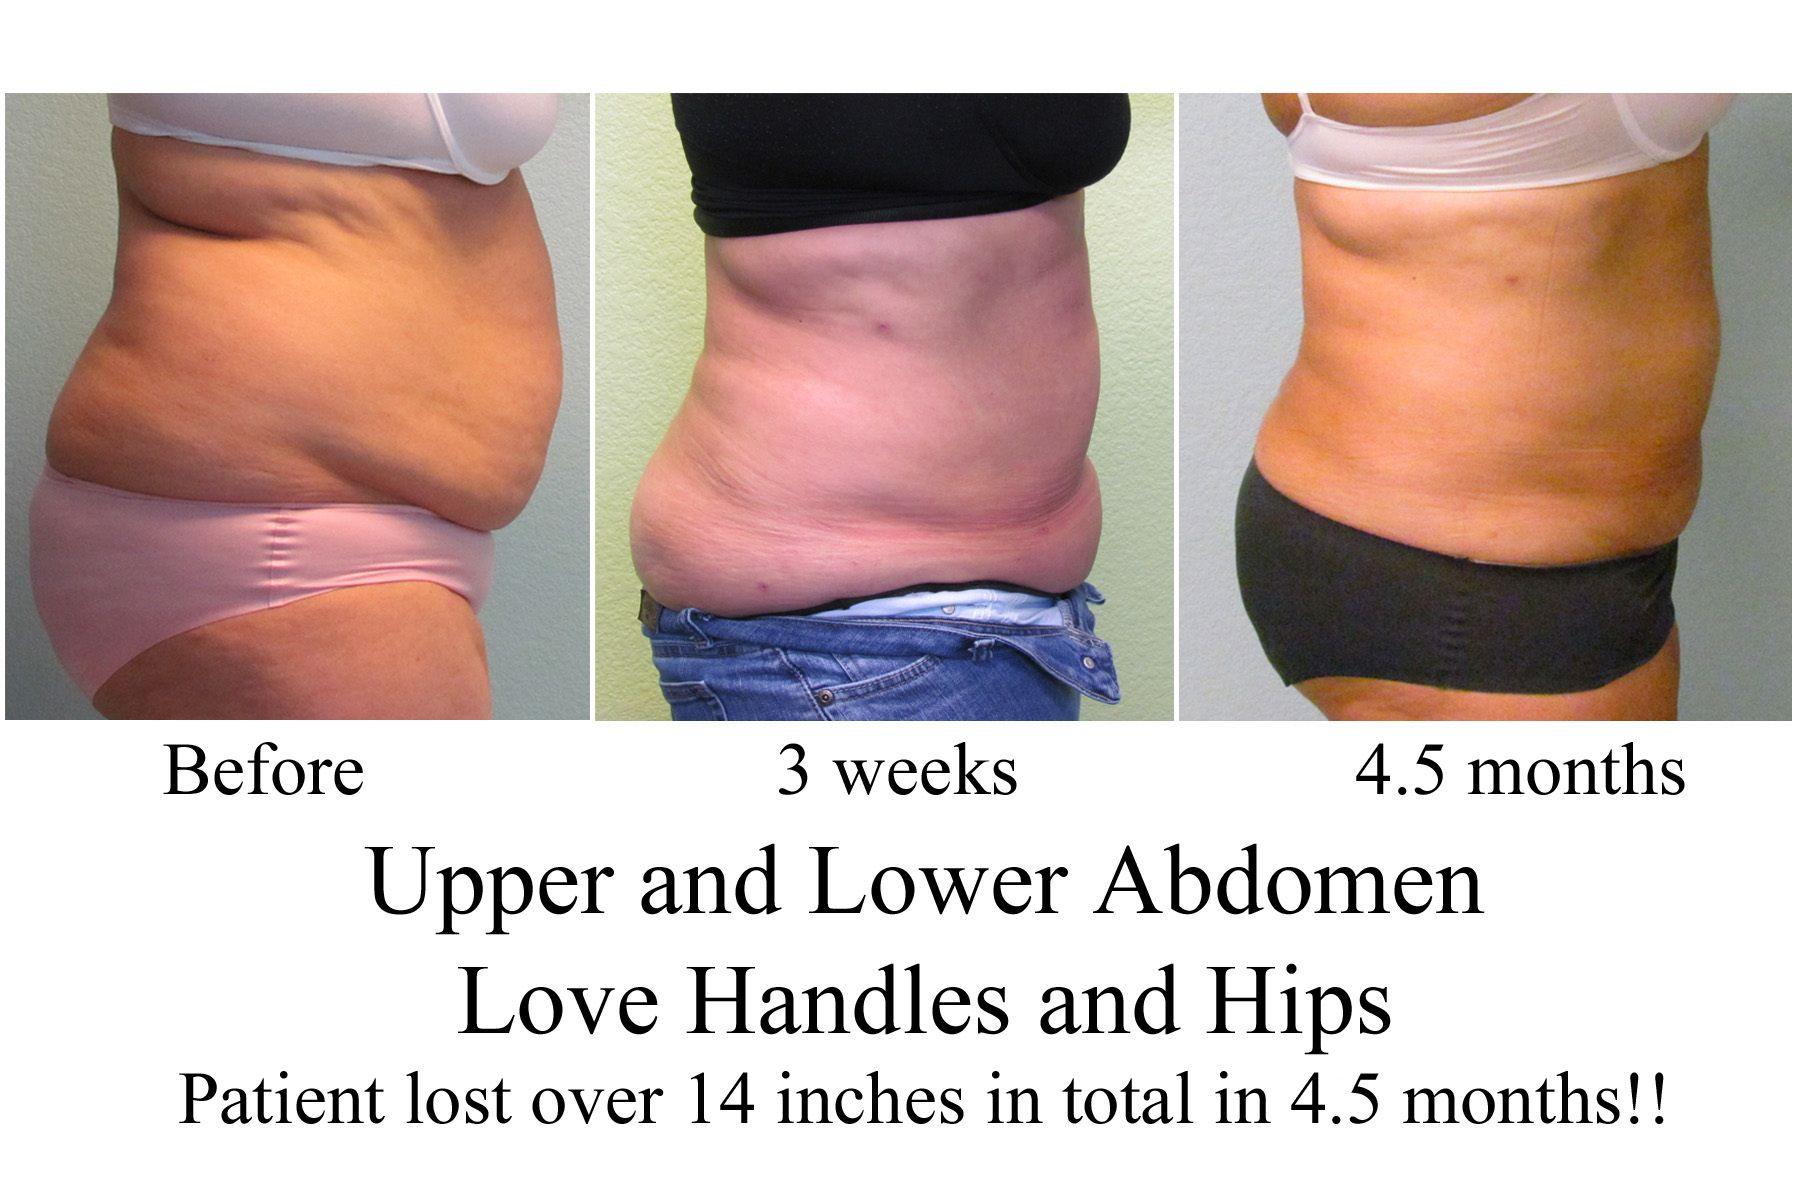 Abdomen Liposuction Healing Process ...